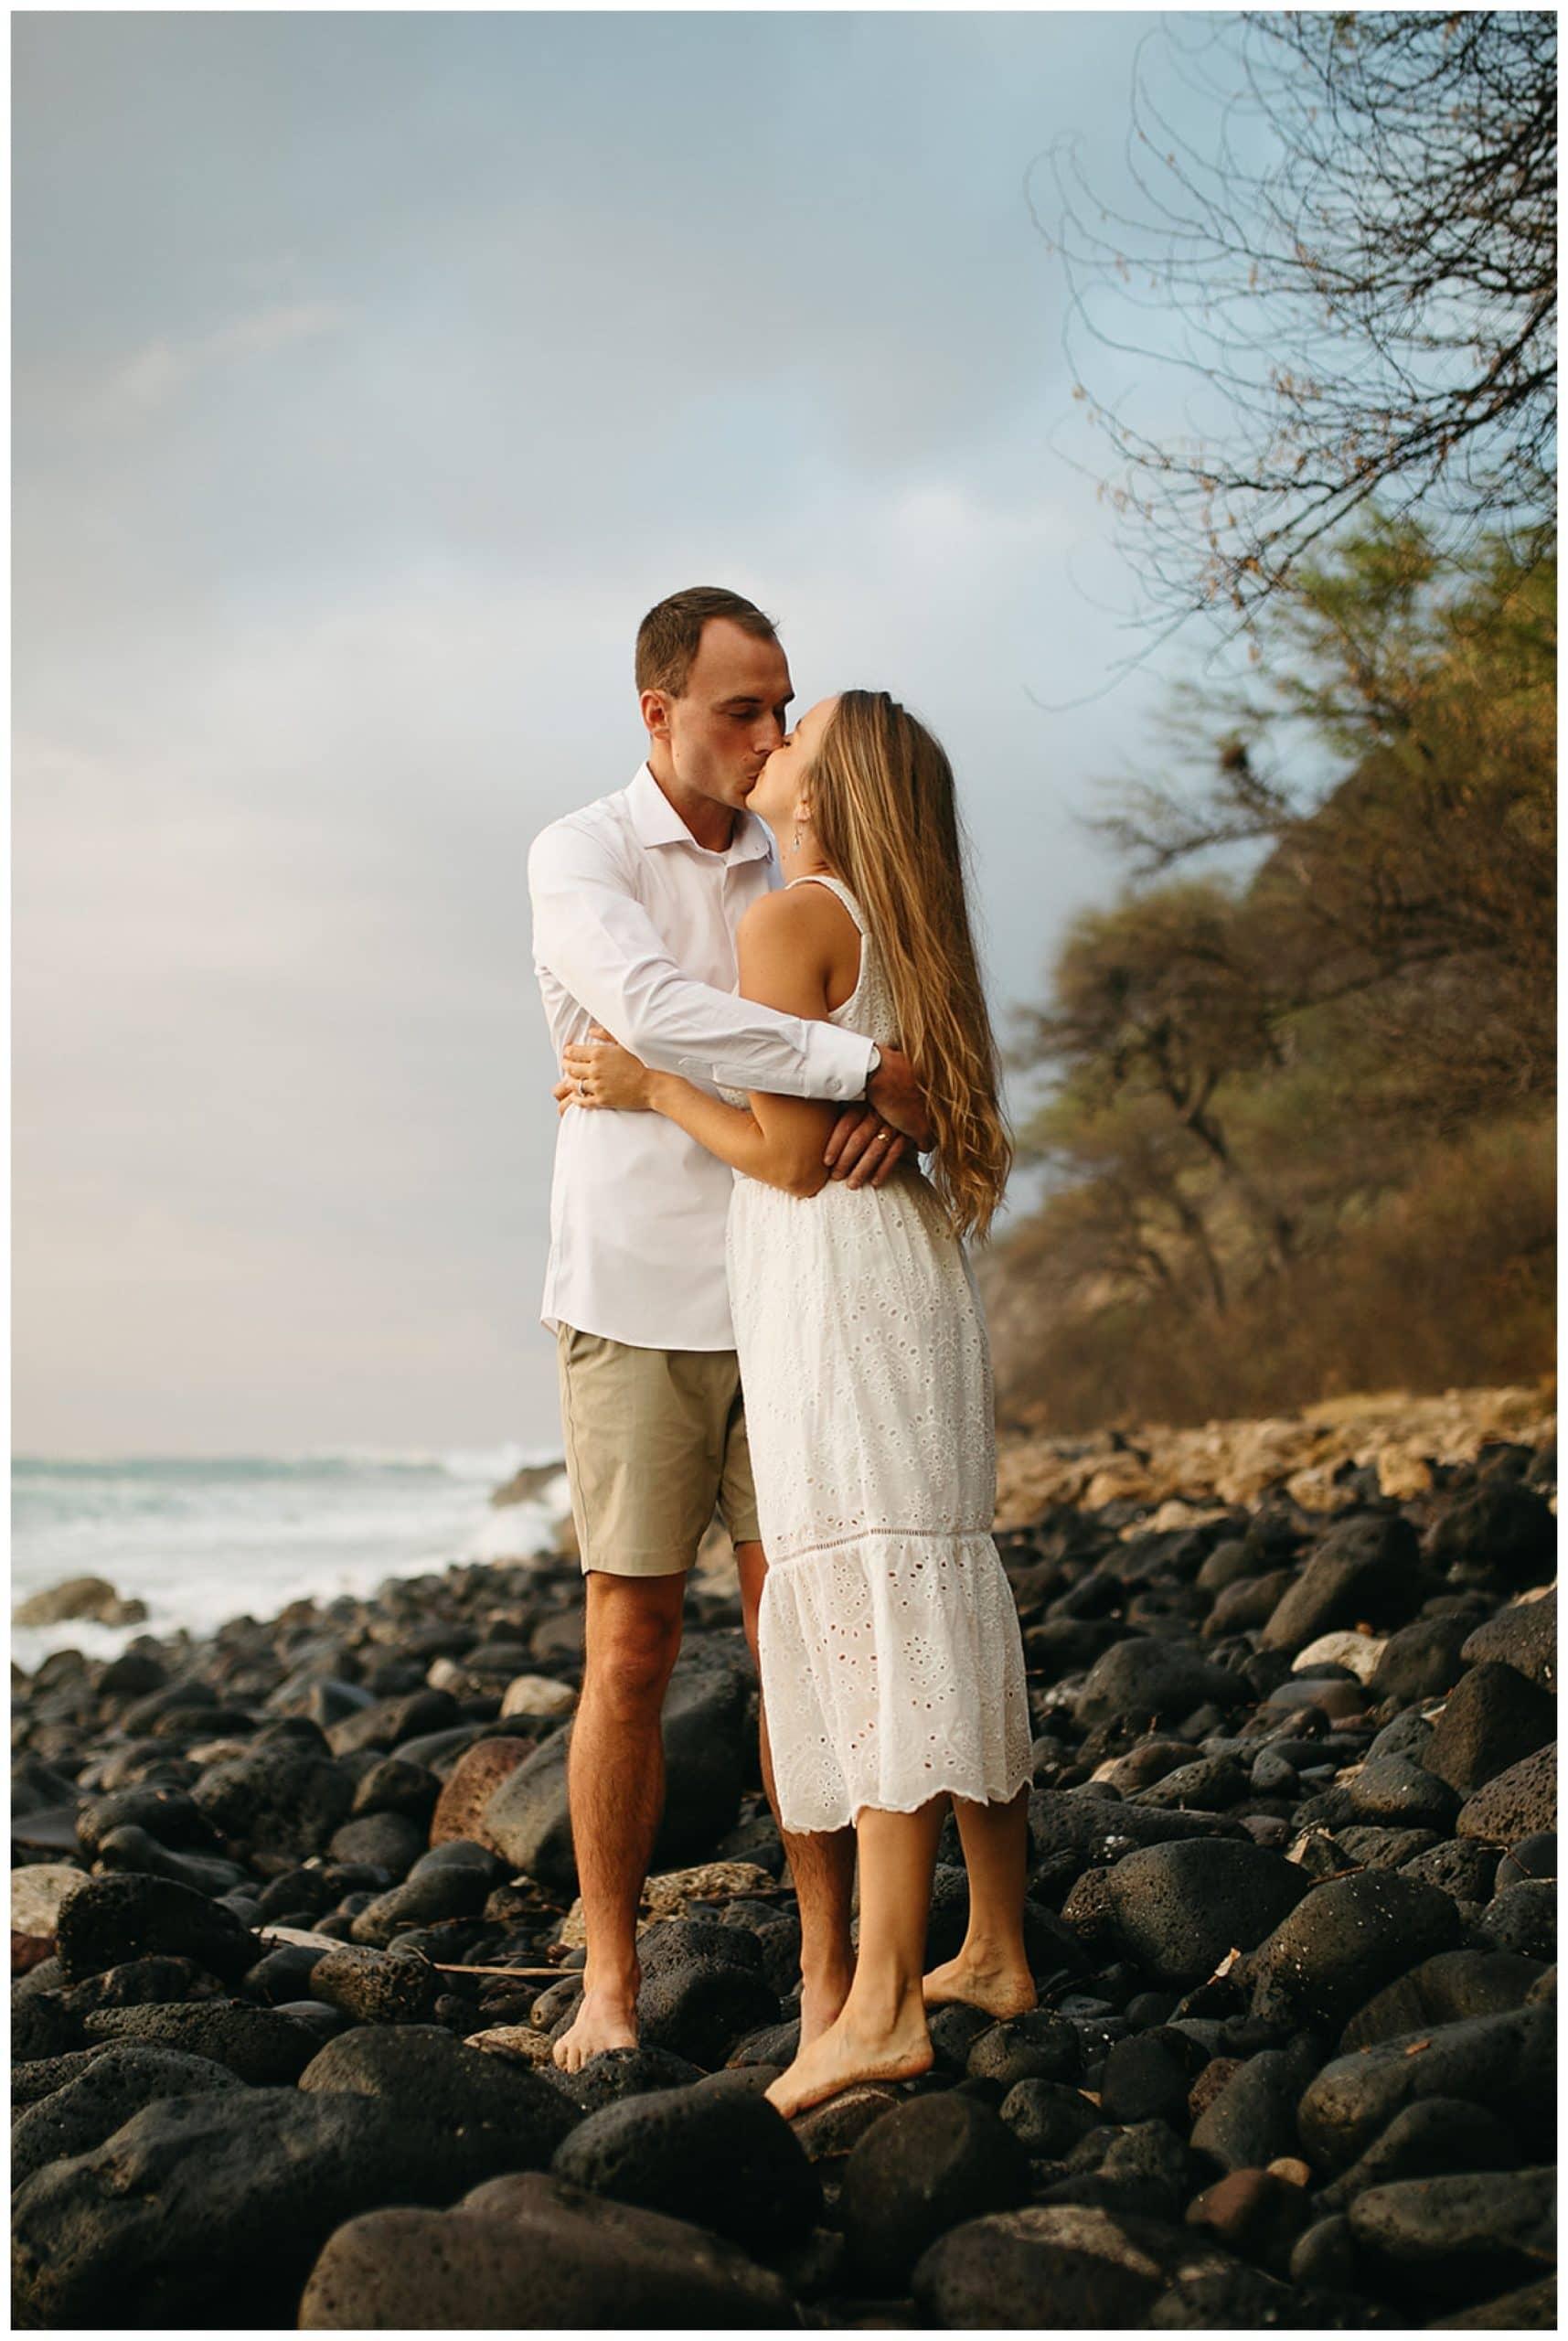 couple kissing on rocks on beach